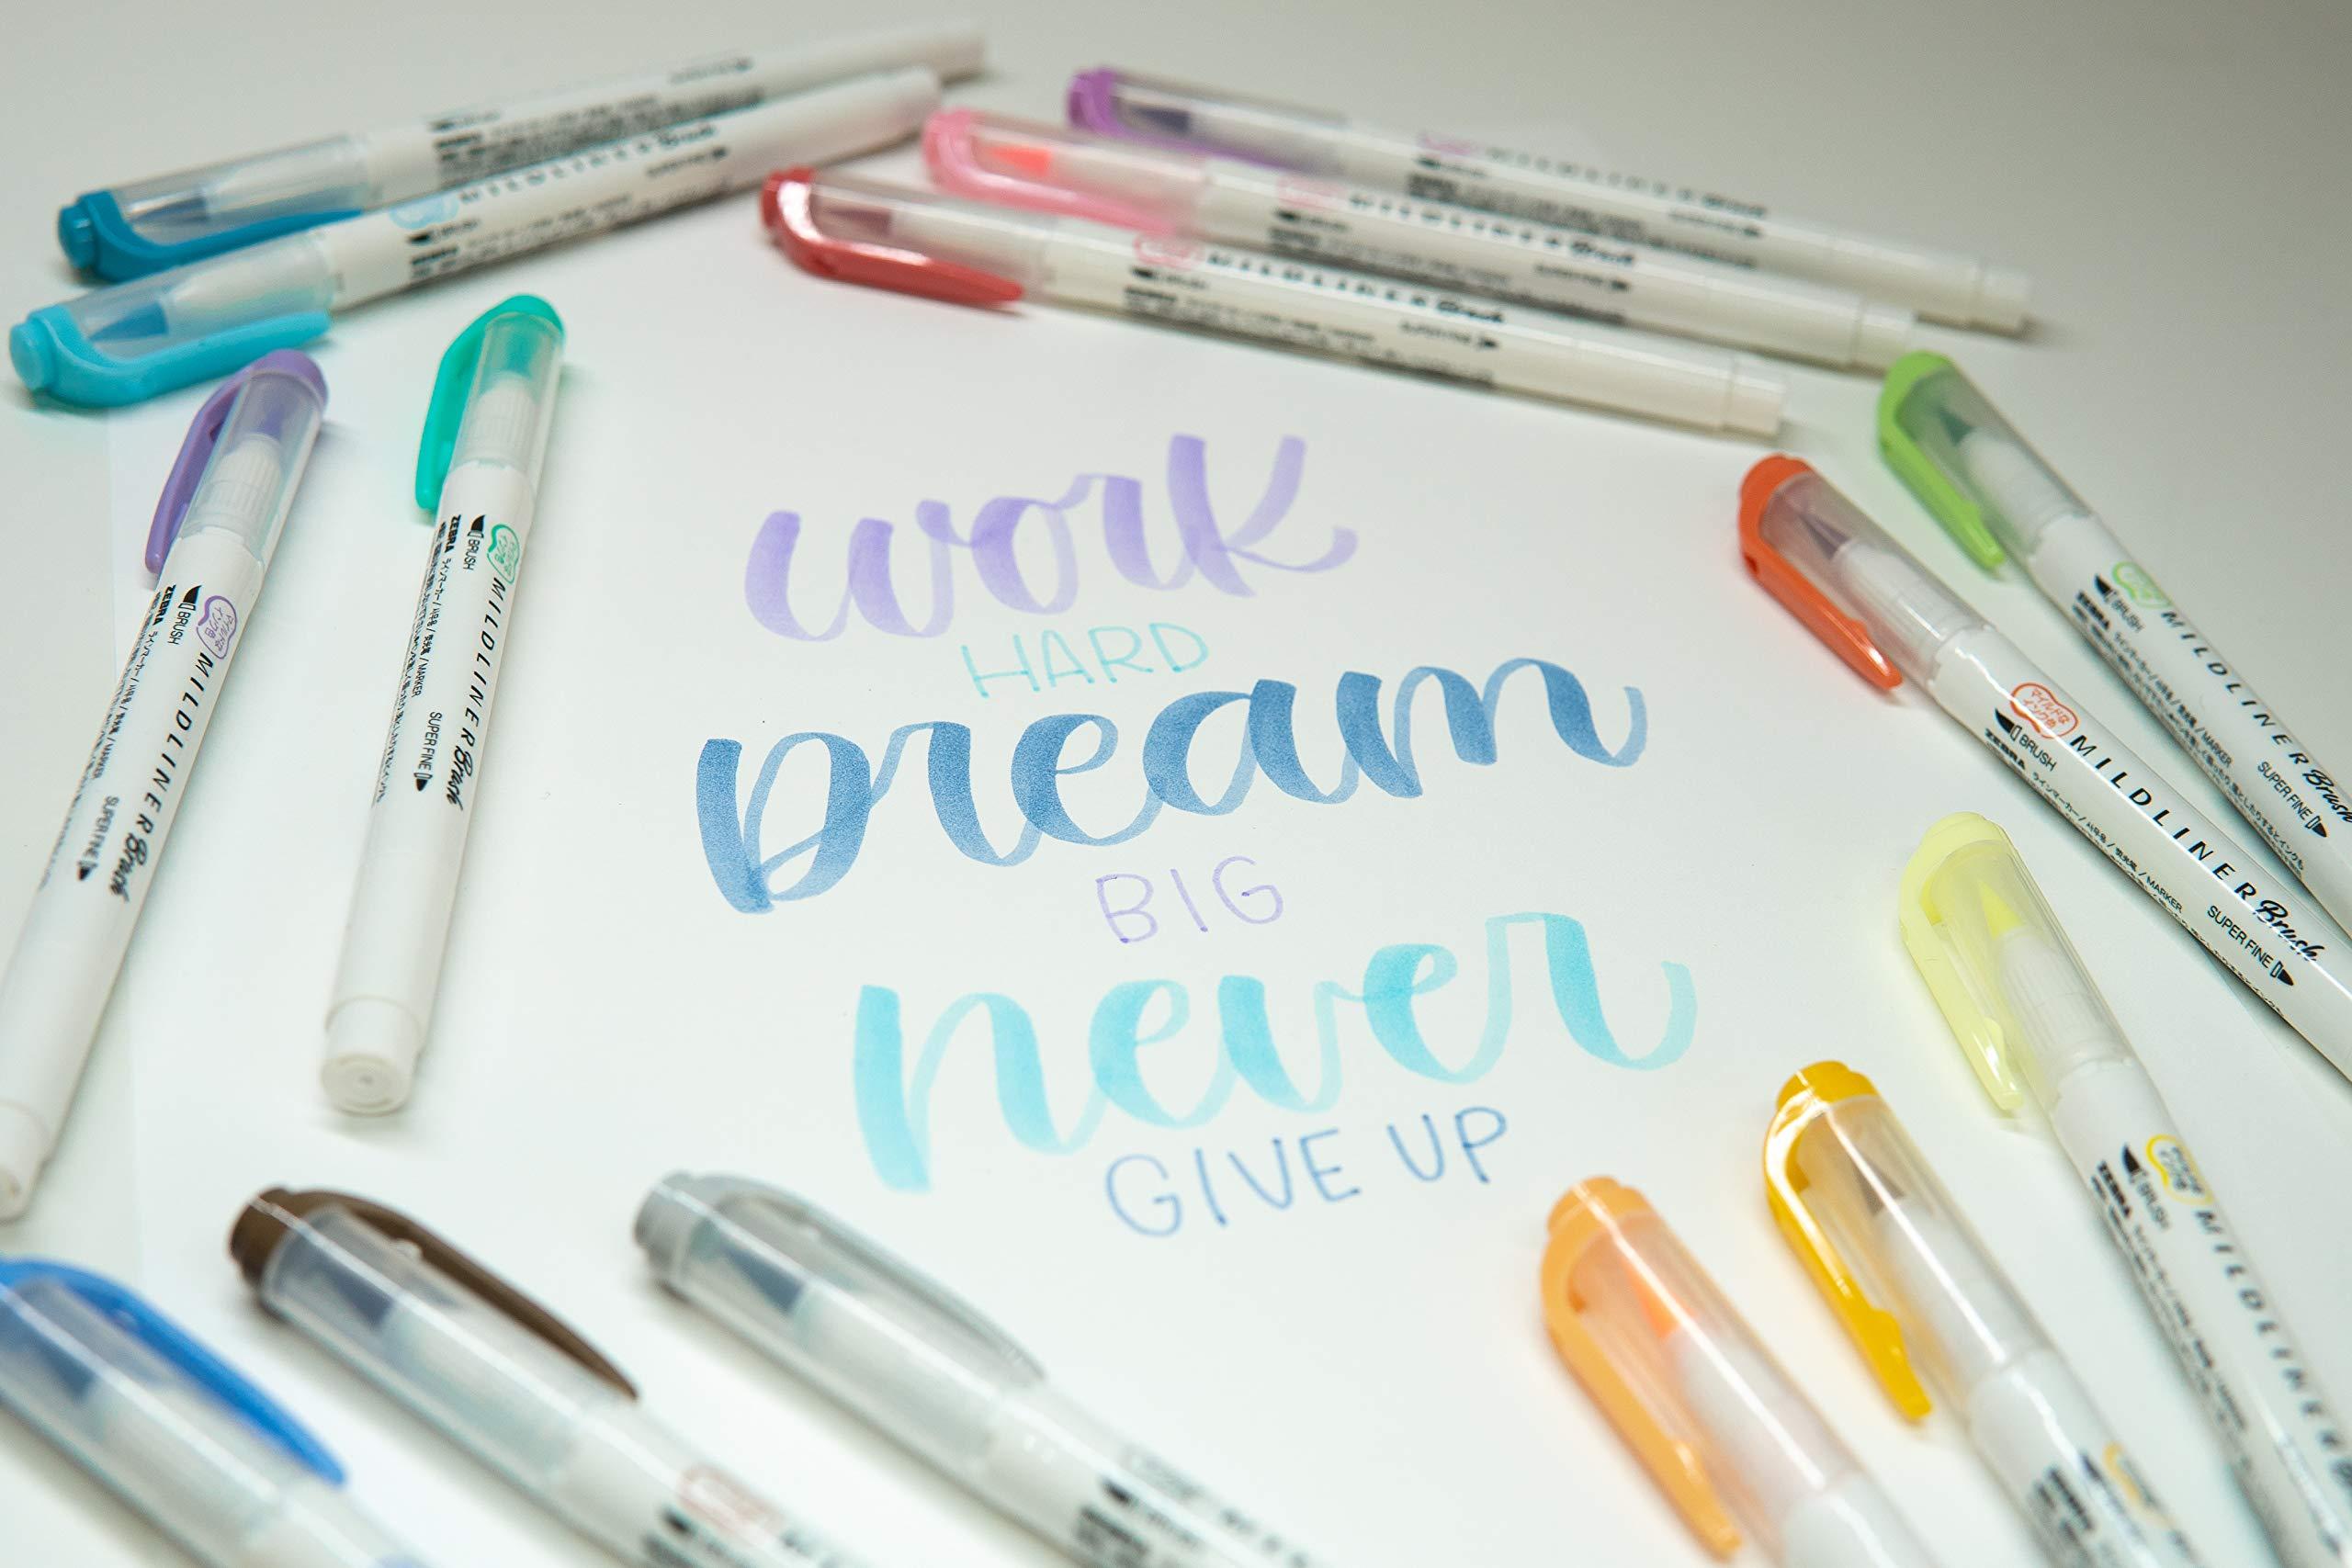 Zebra Pen Mildliner Double Ended Brush and Fine Tip Pen, Assorted Colors, 15-Count by Zebra Pen (Image #4)